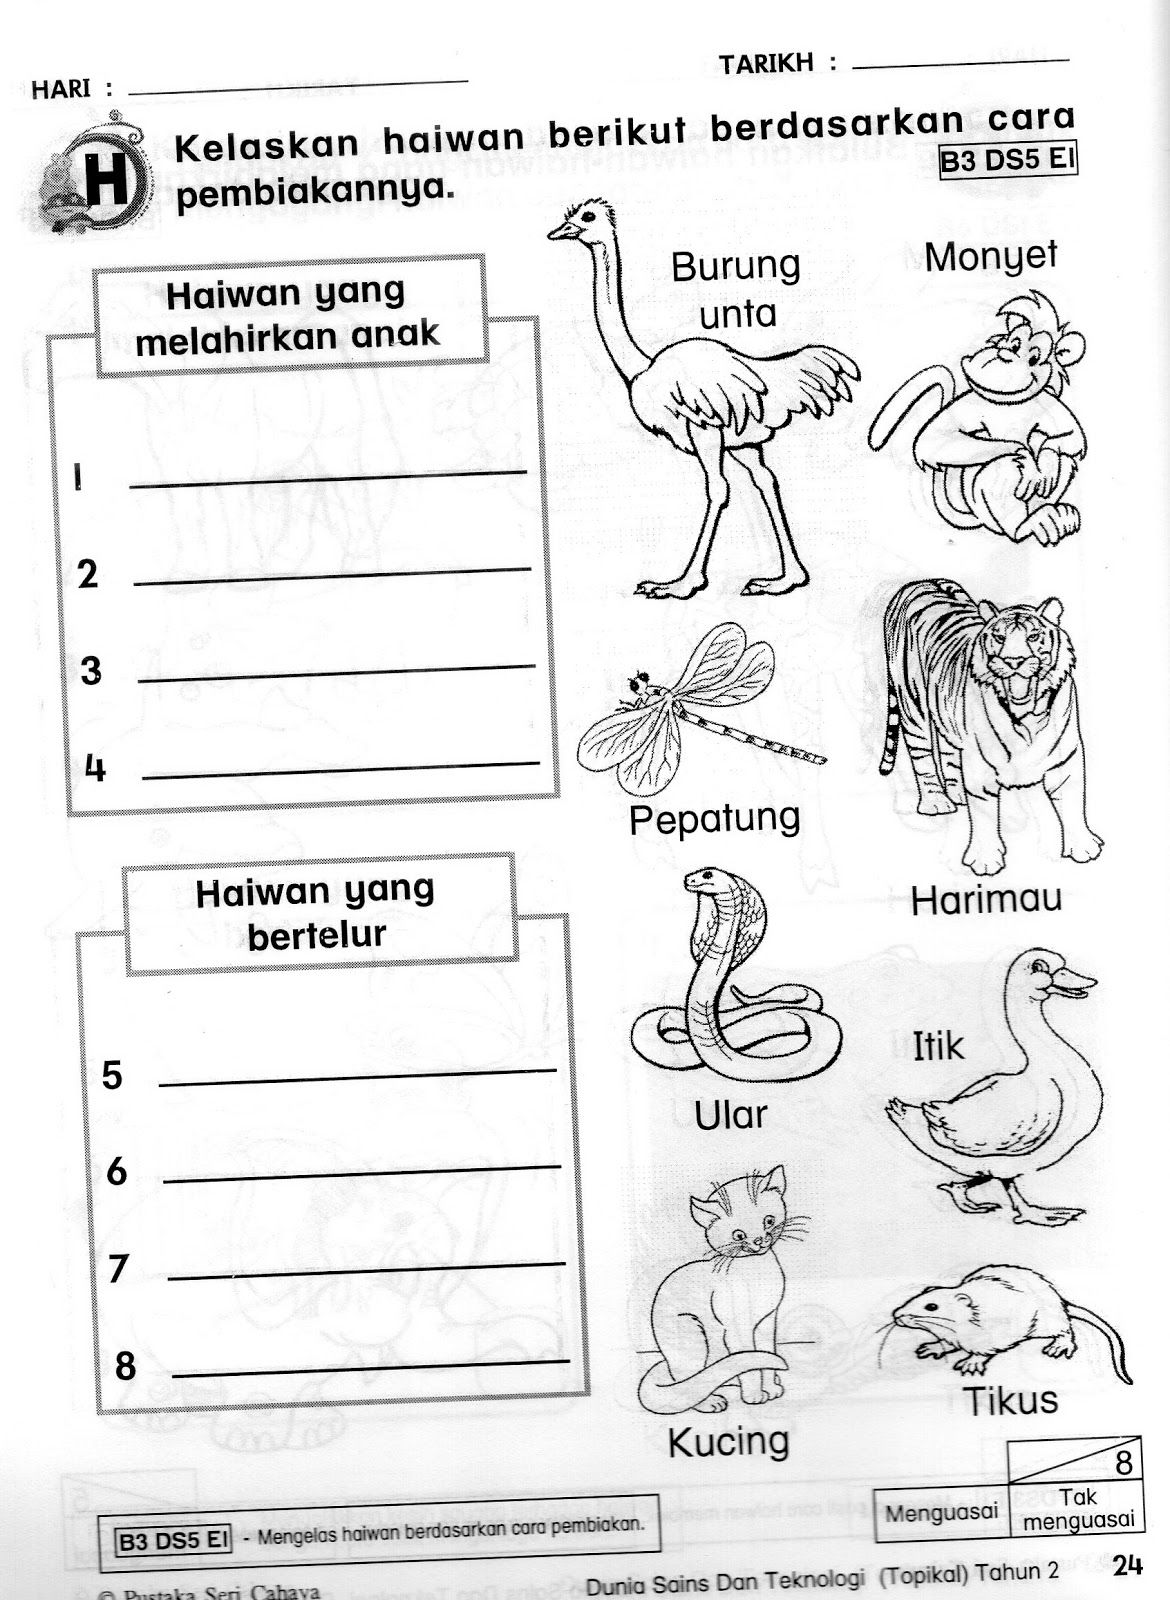 Contoh Worksheet Sains Untuk Kindergarten Printable Worksheets And Activities For Teachers Parents Tutors And Homeschool Families